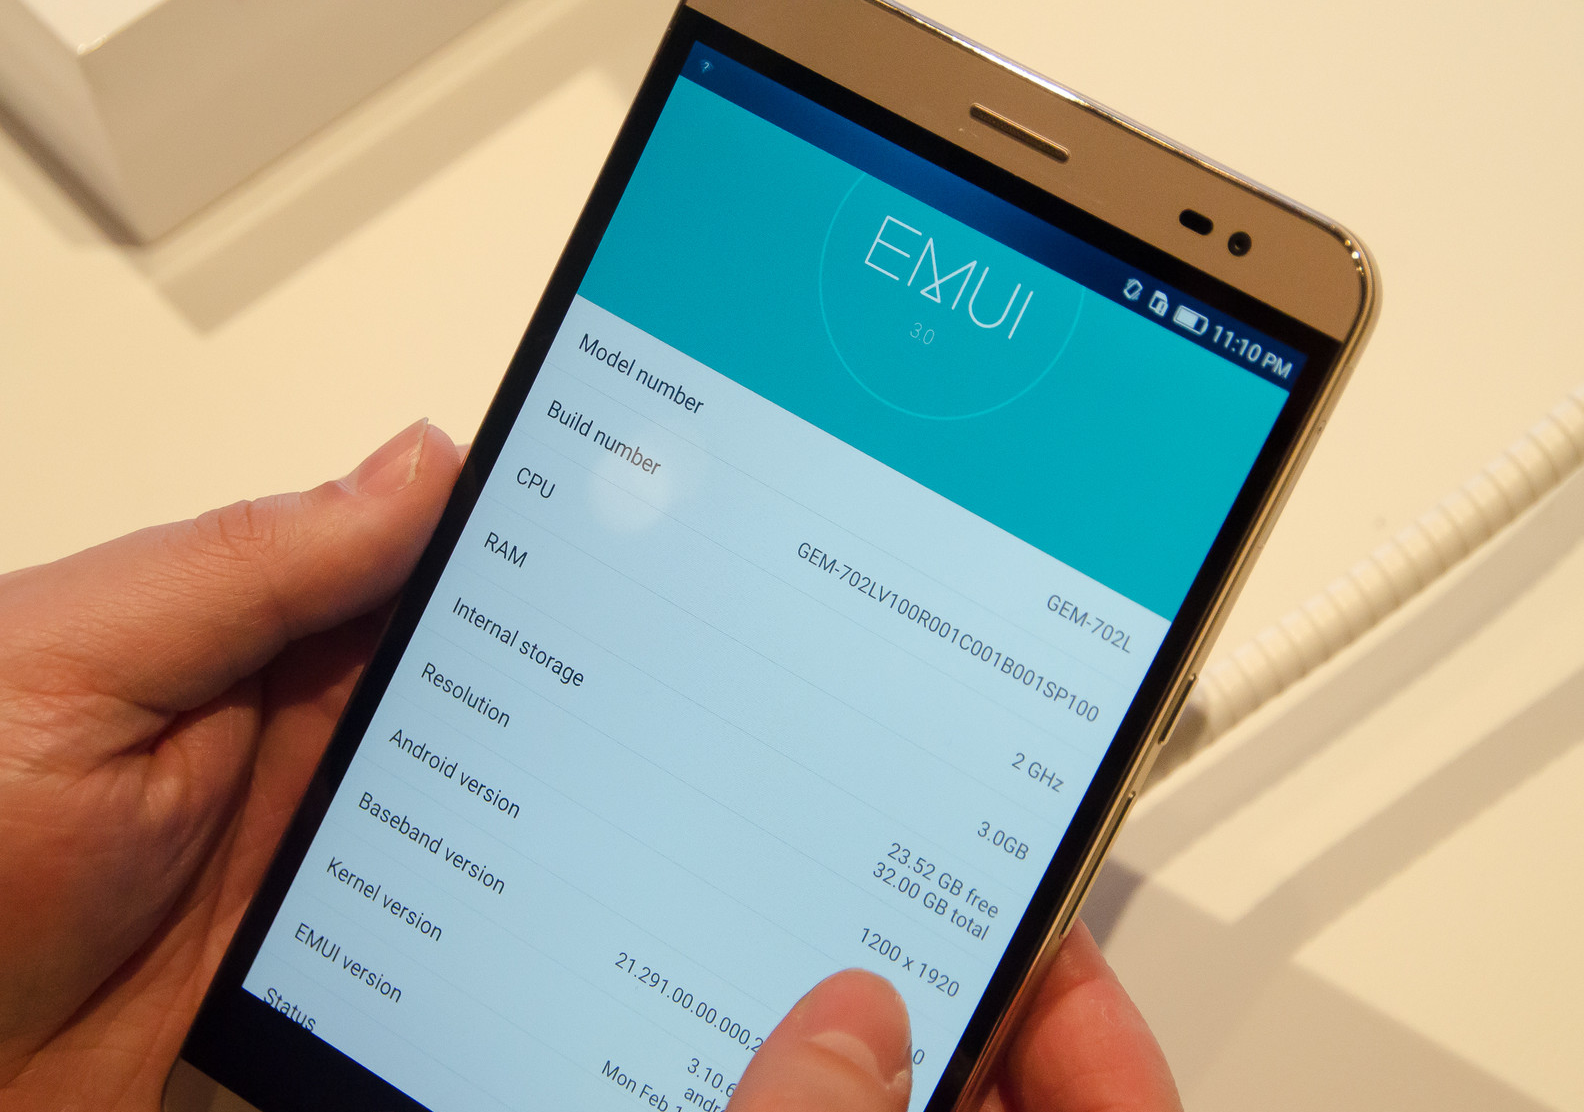 Huawei MediaPad X2 - EMUI 3.0